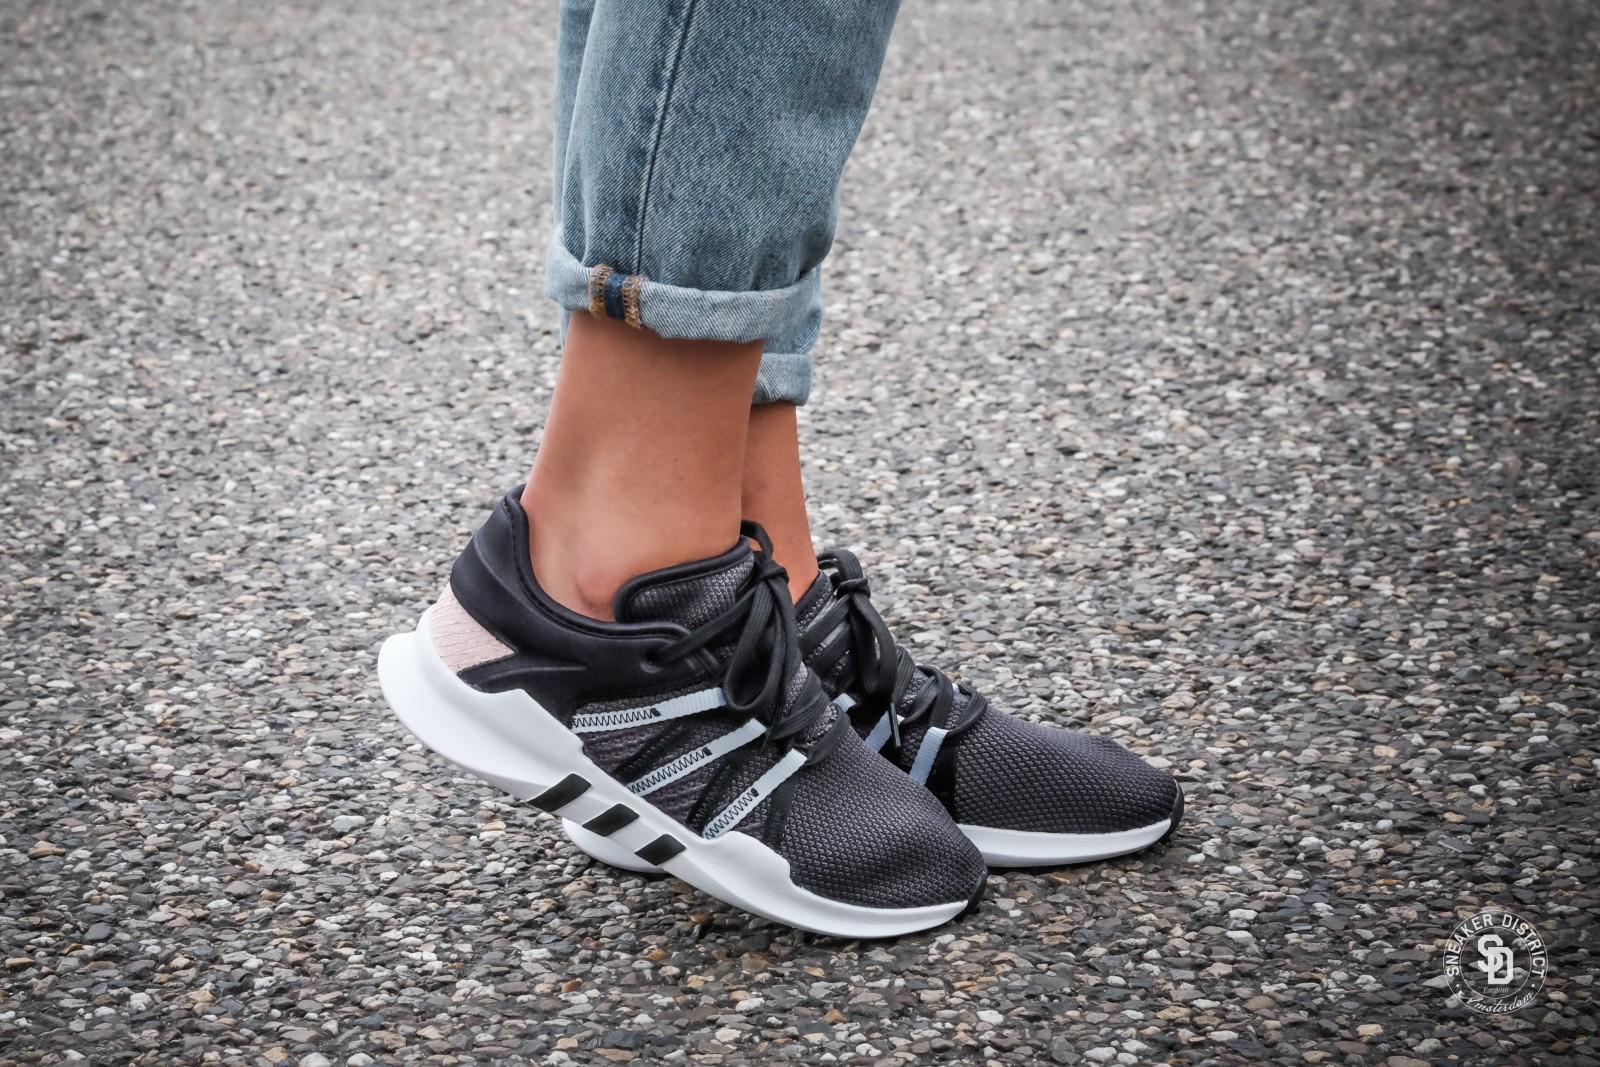 combustible disco Descodificar  adidas eqt adv racing shoes women's off 63% - www.corumeo.org